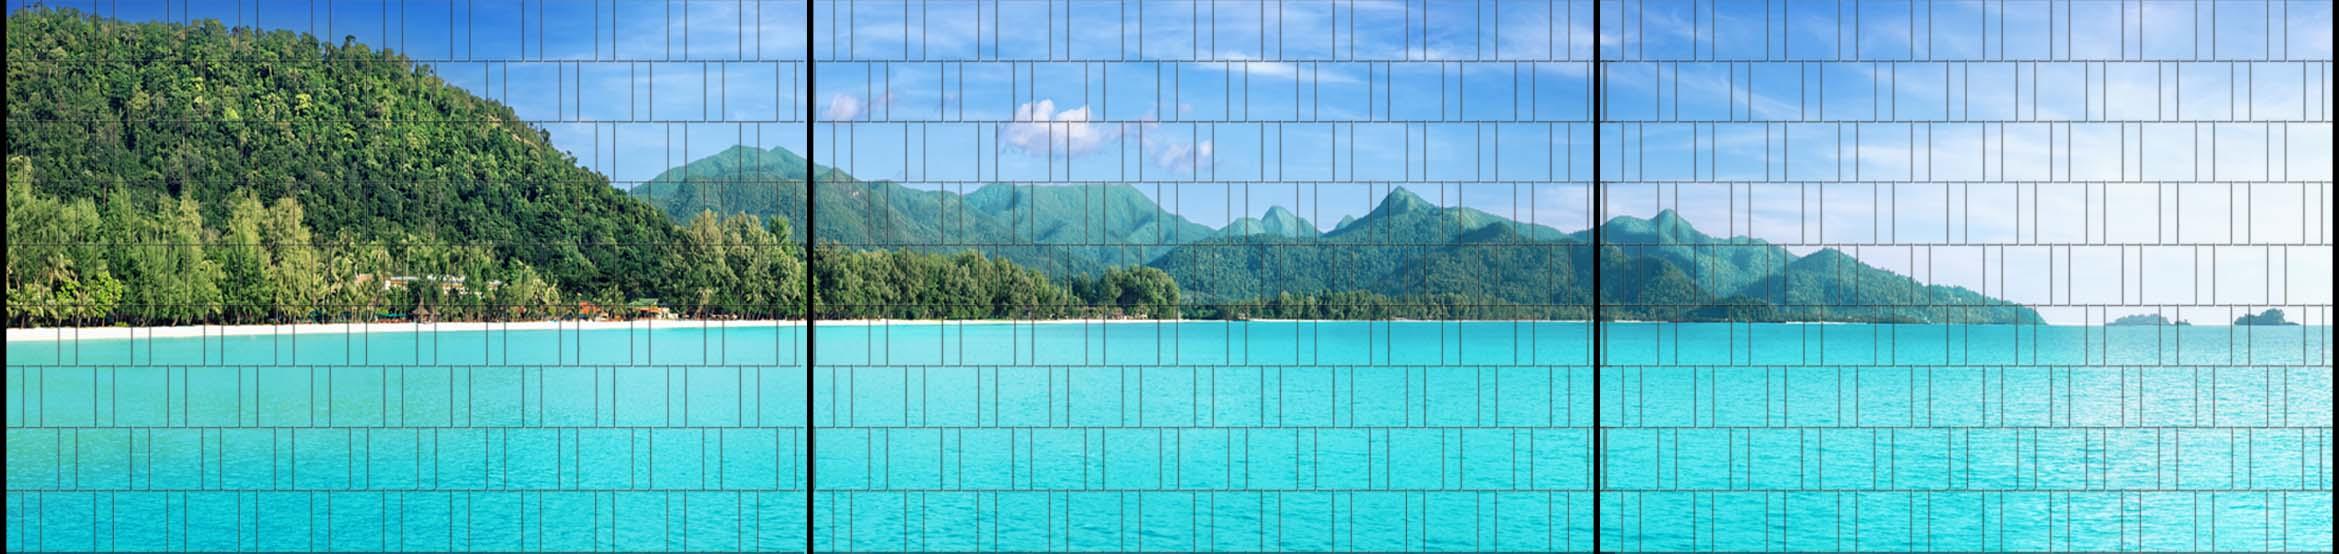 Panorama XXL Bedruckter Sichtschutz Streifen Matten Zaun inkl Park Klemmen